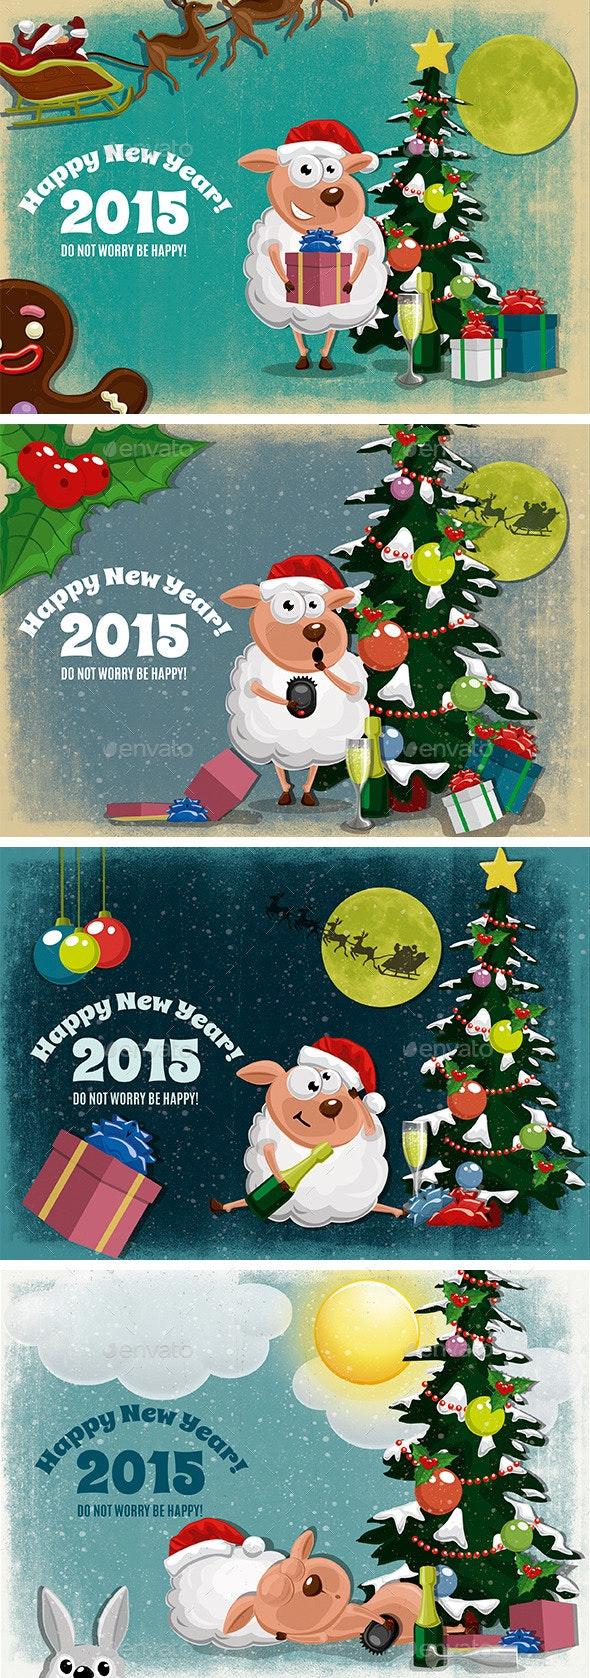 Christmas Story Of A Lamb - Illustrations Graphics